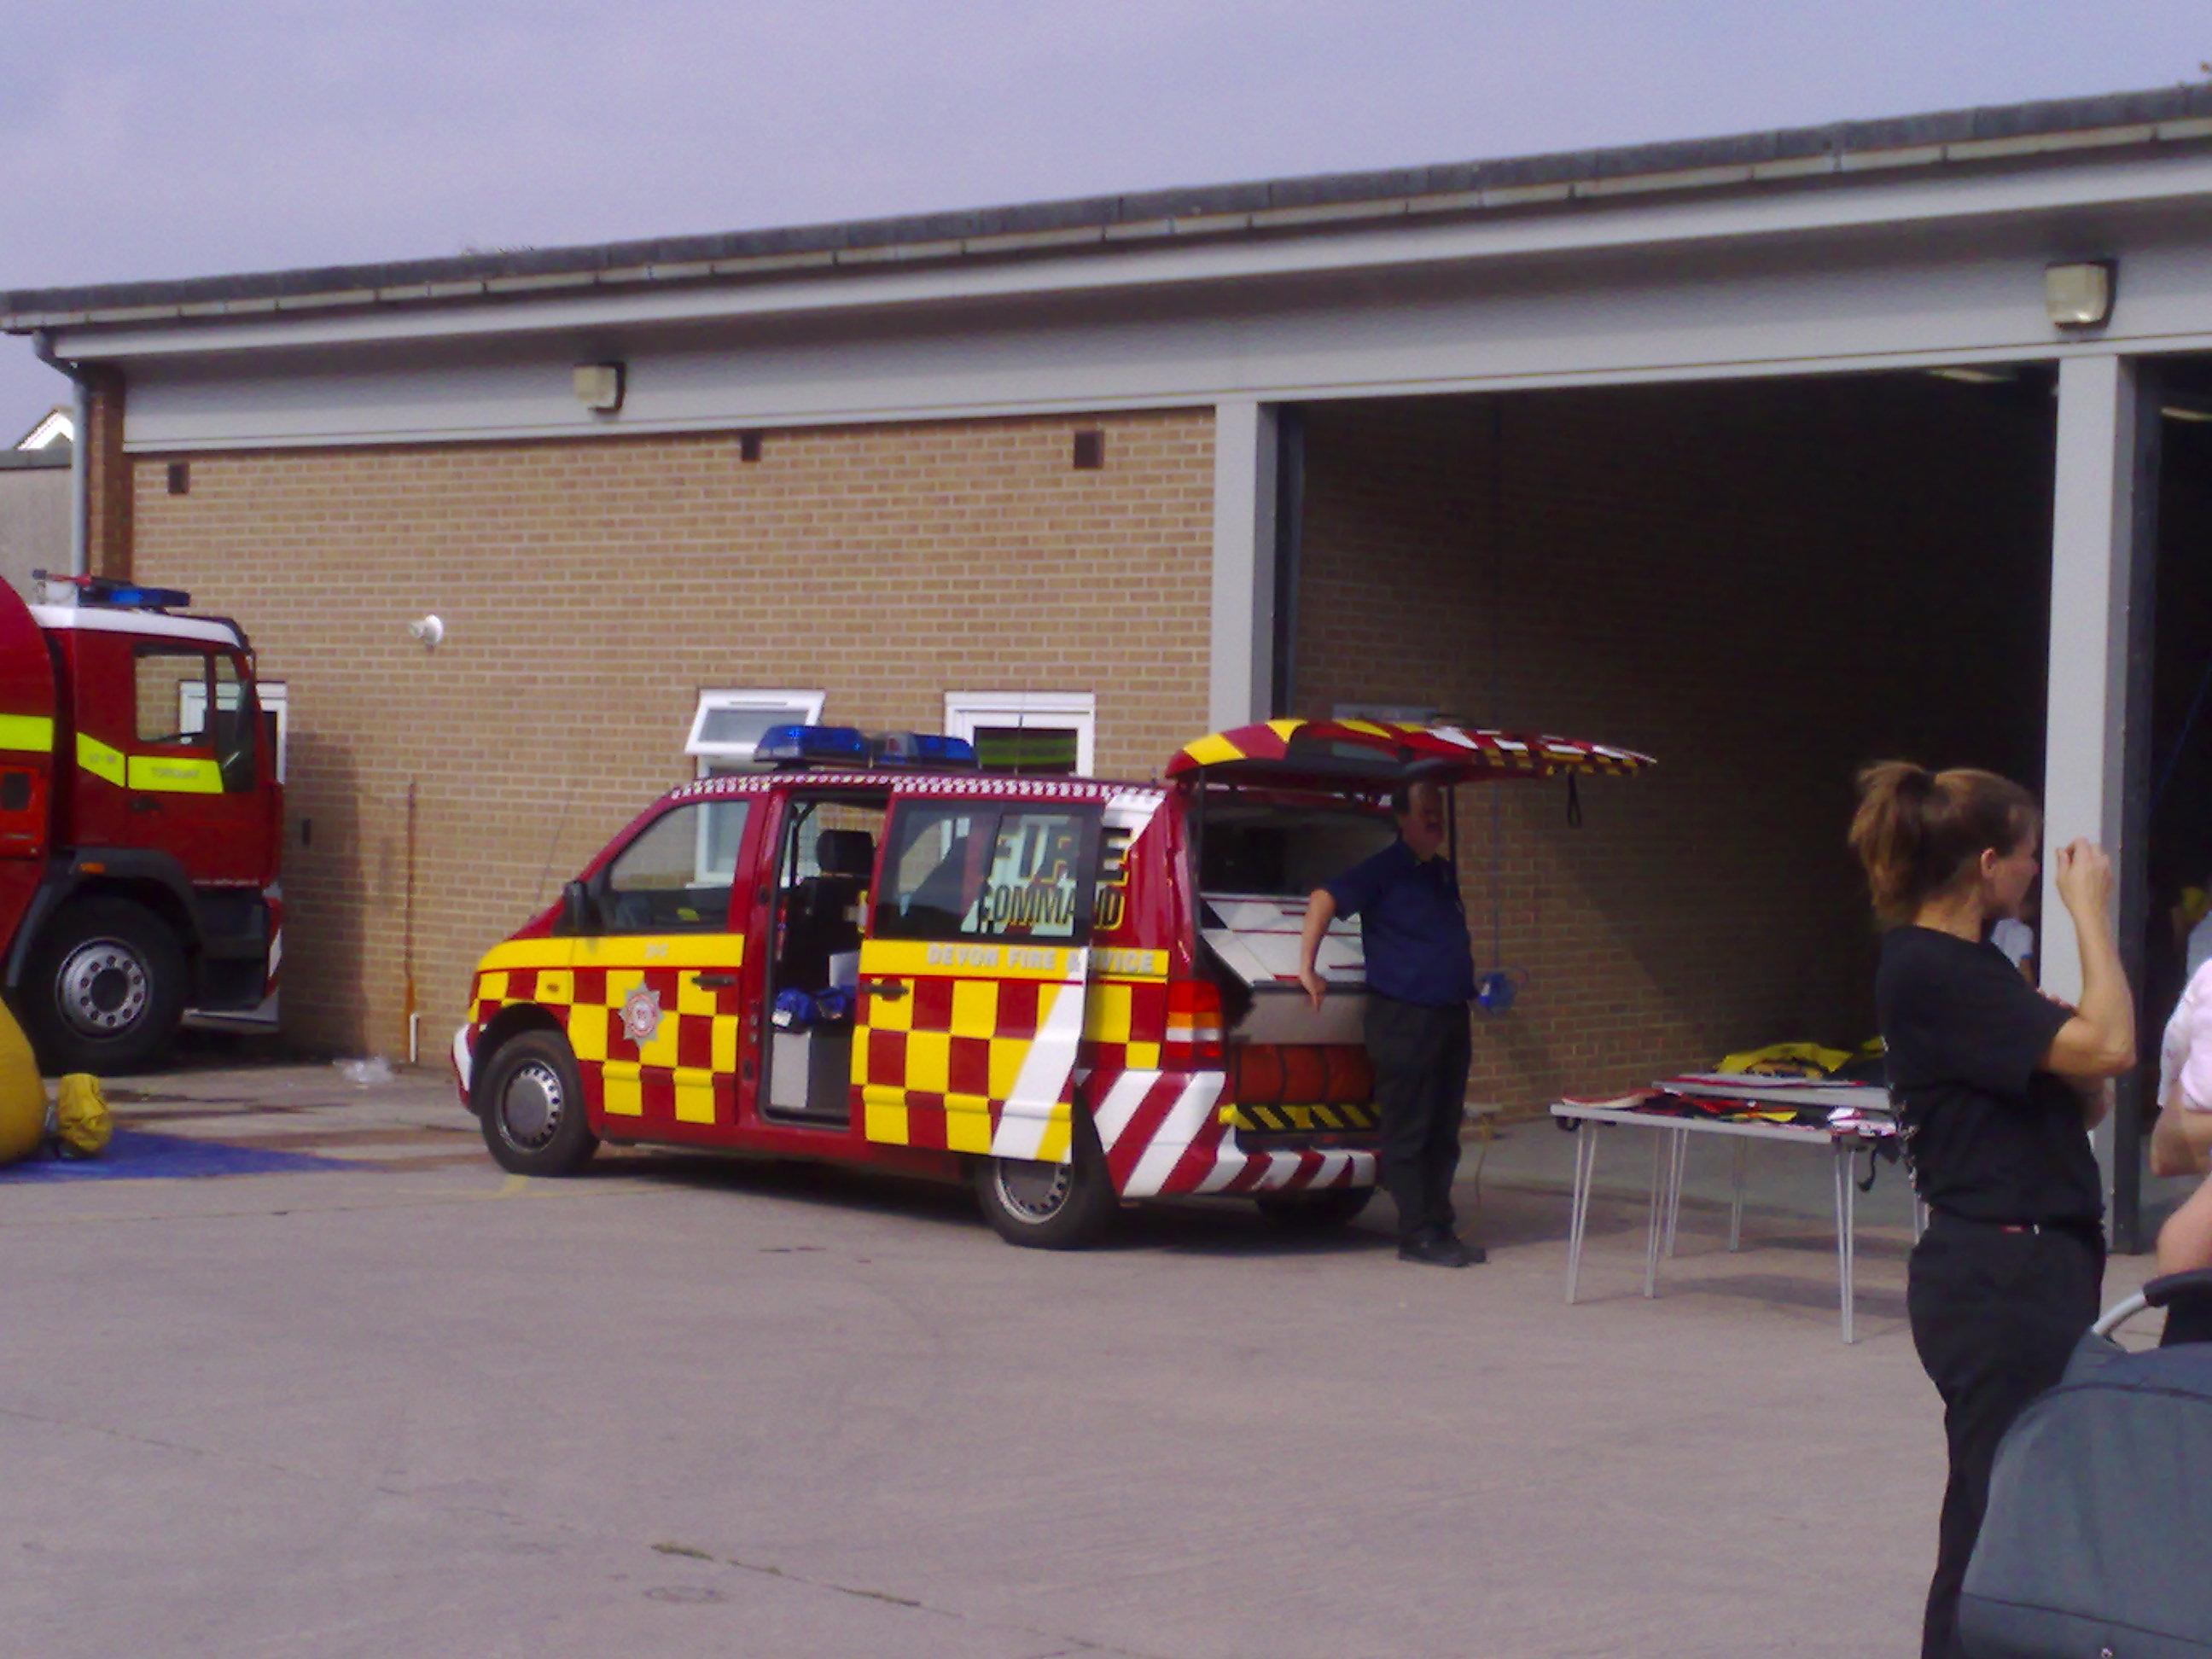 Incident Command Vehicles